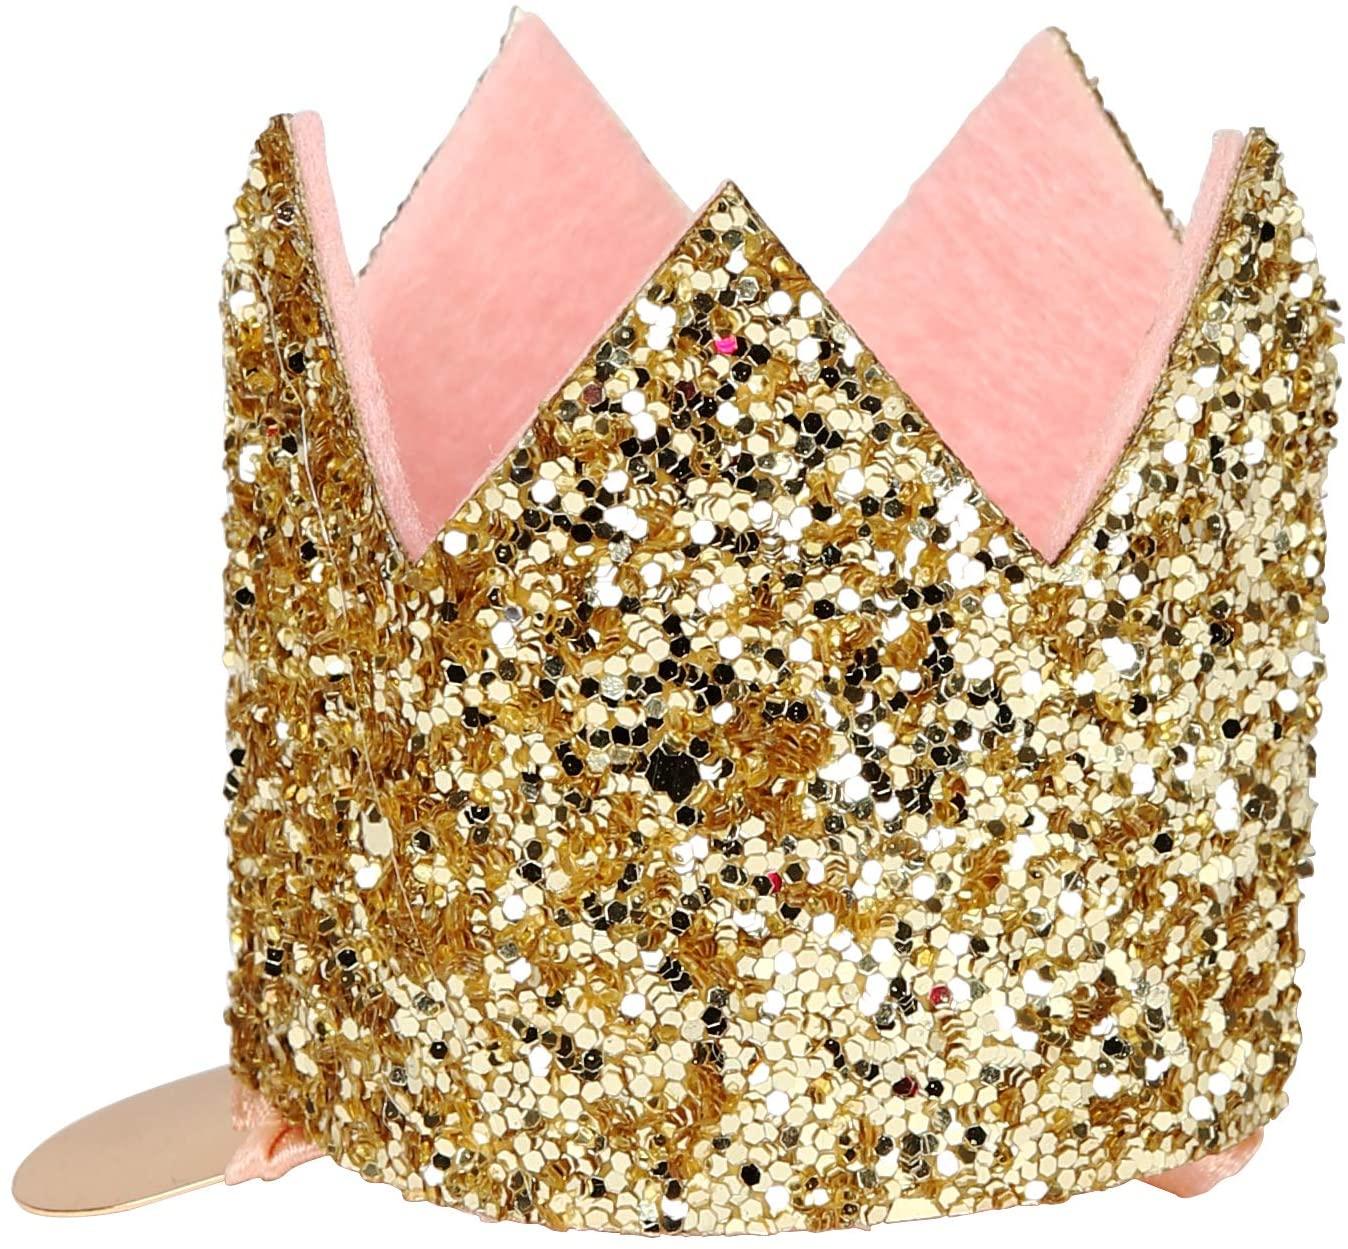 Meri Meri Mini Gold Glitter Crown Hair Clip - Glitter Fabric with Pink Felt Lining